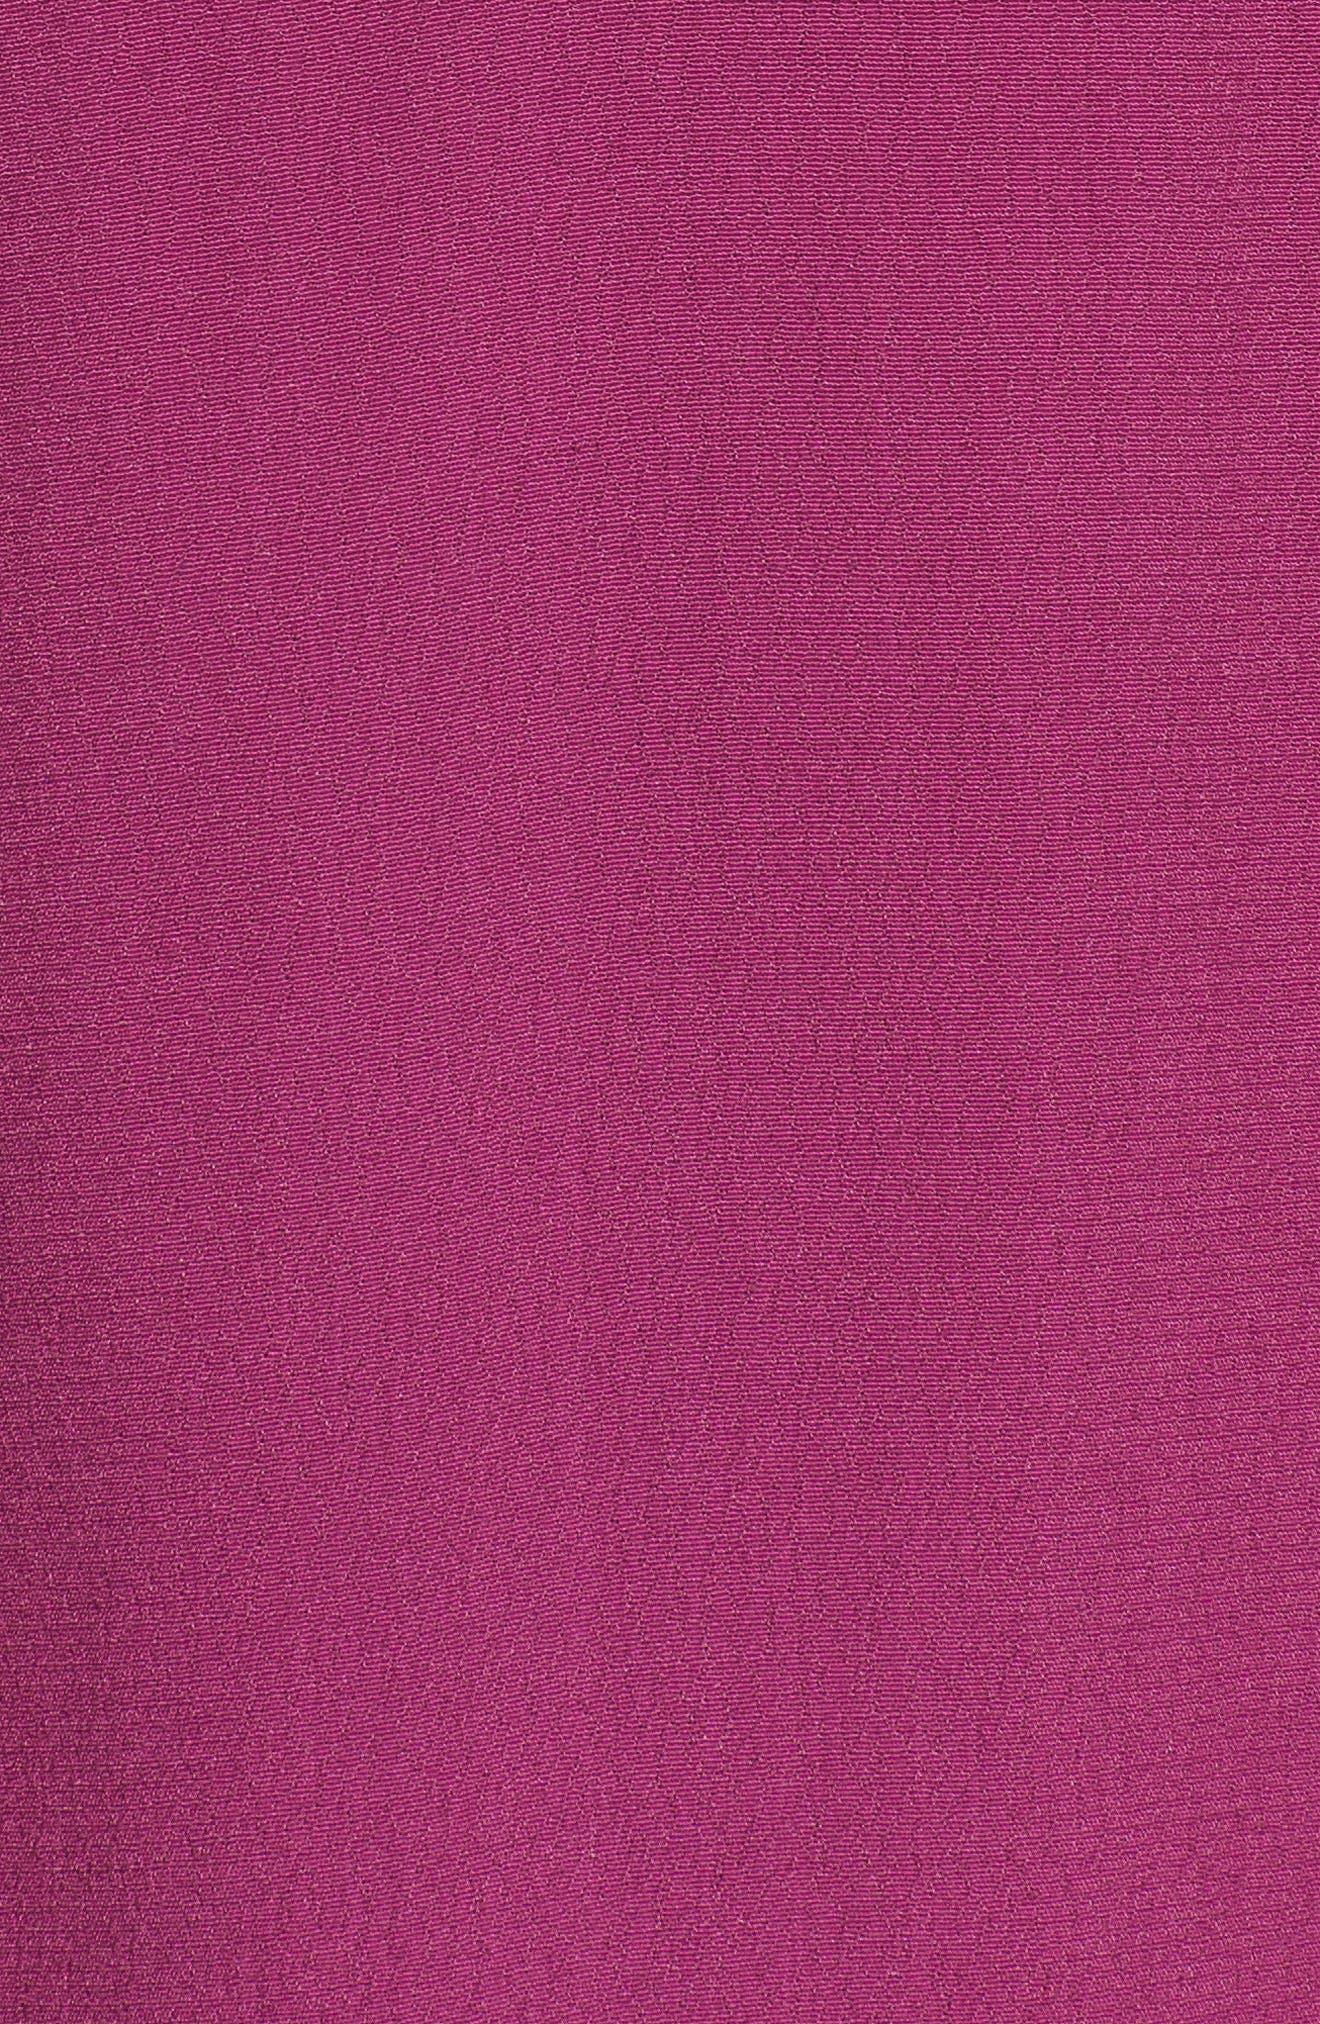 V-Neck Puff Sleeve Dress,                             Alternate thumbnail 6, color,                             510